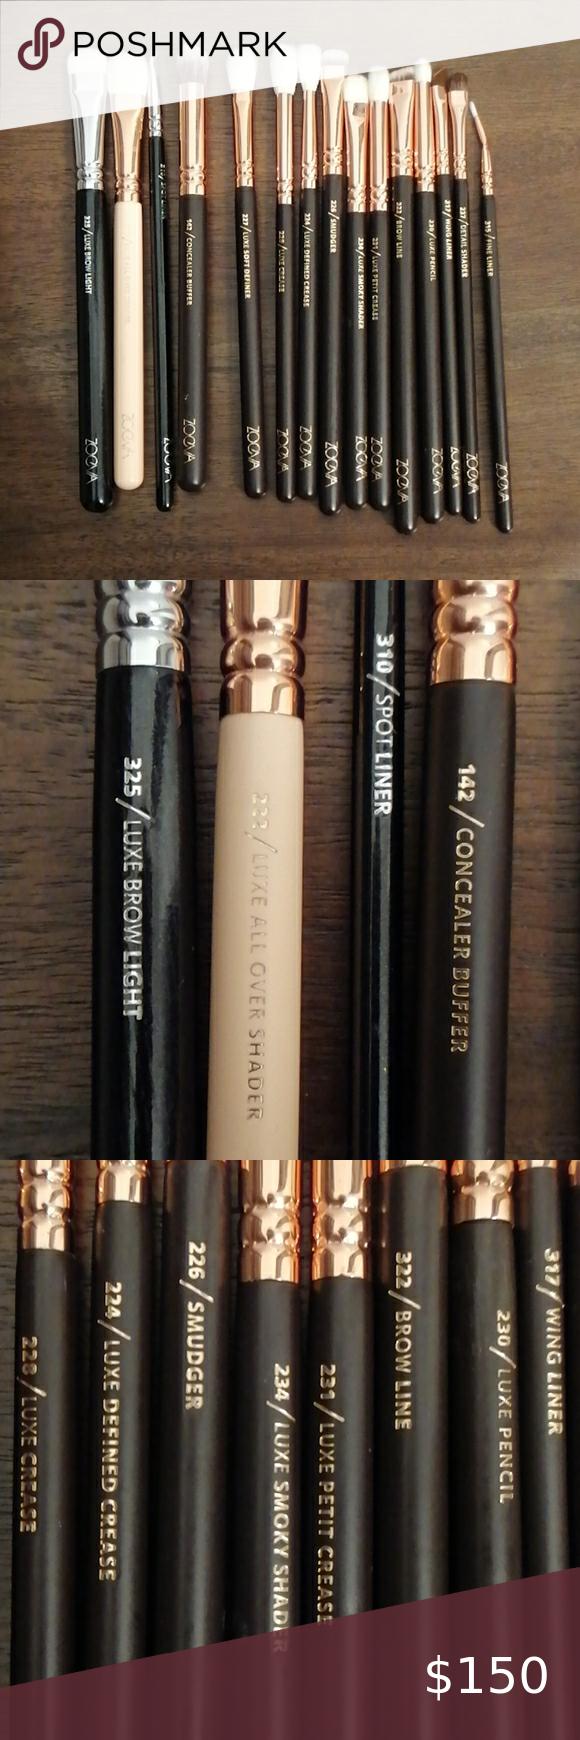 Zoeva eyeshadow brushes in 2020 Eyeshadow brushes